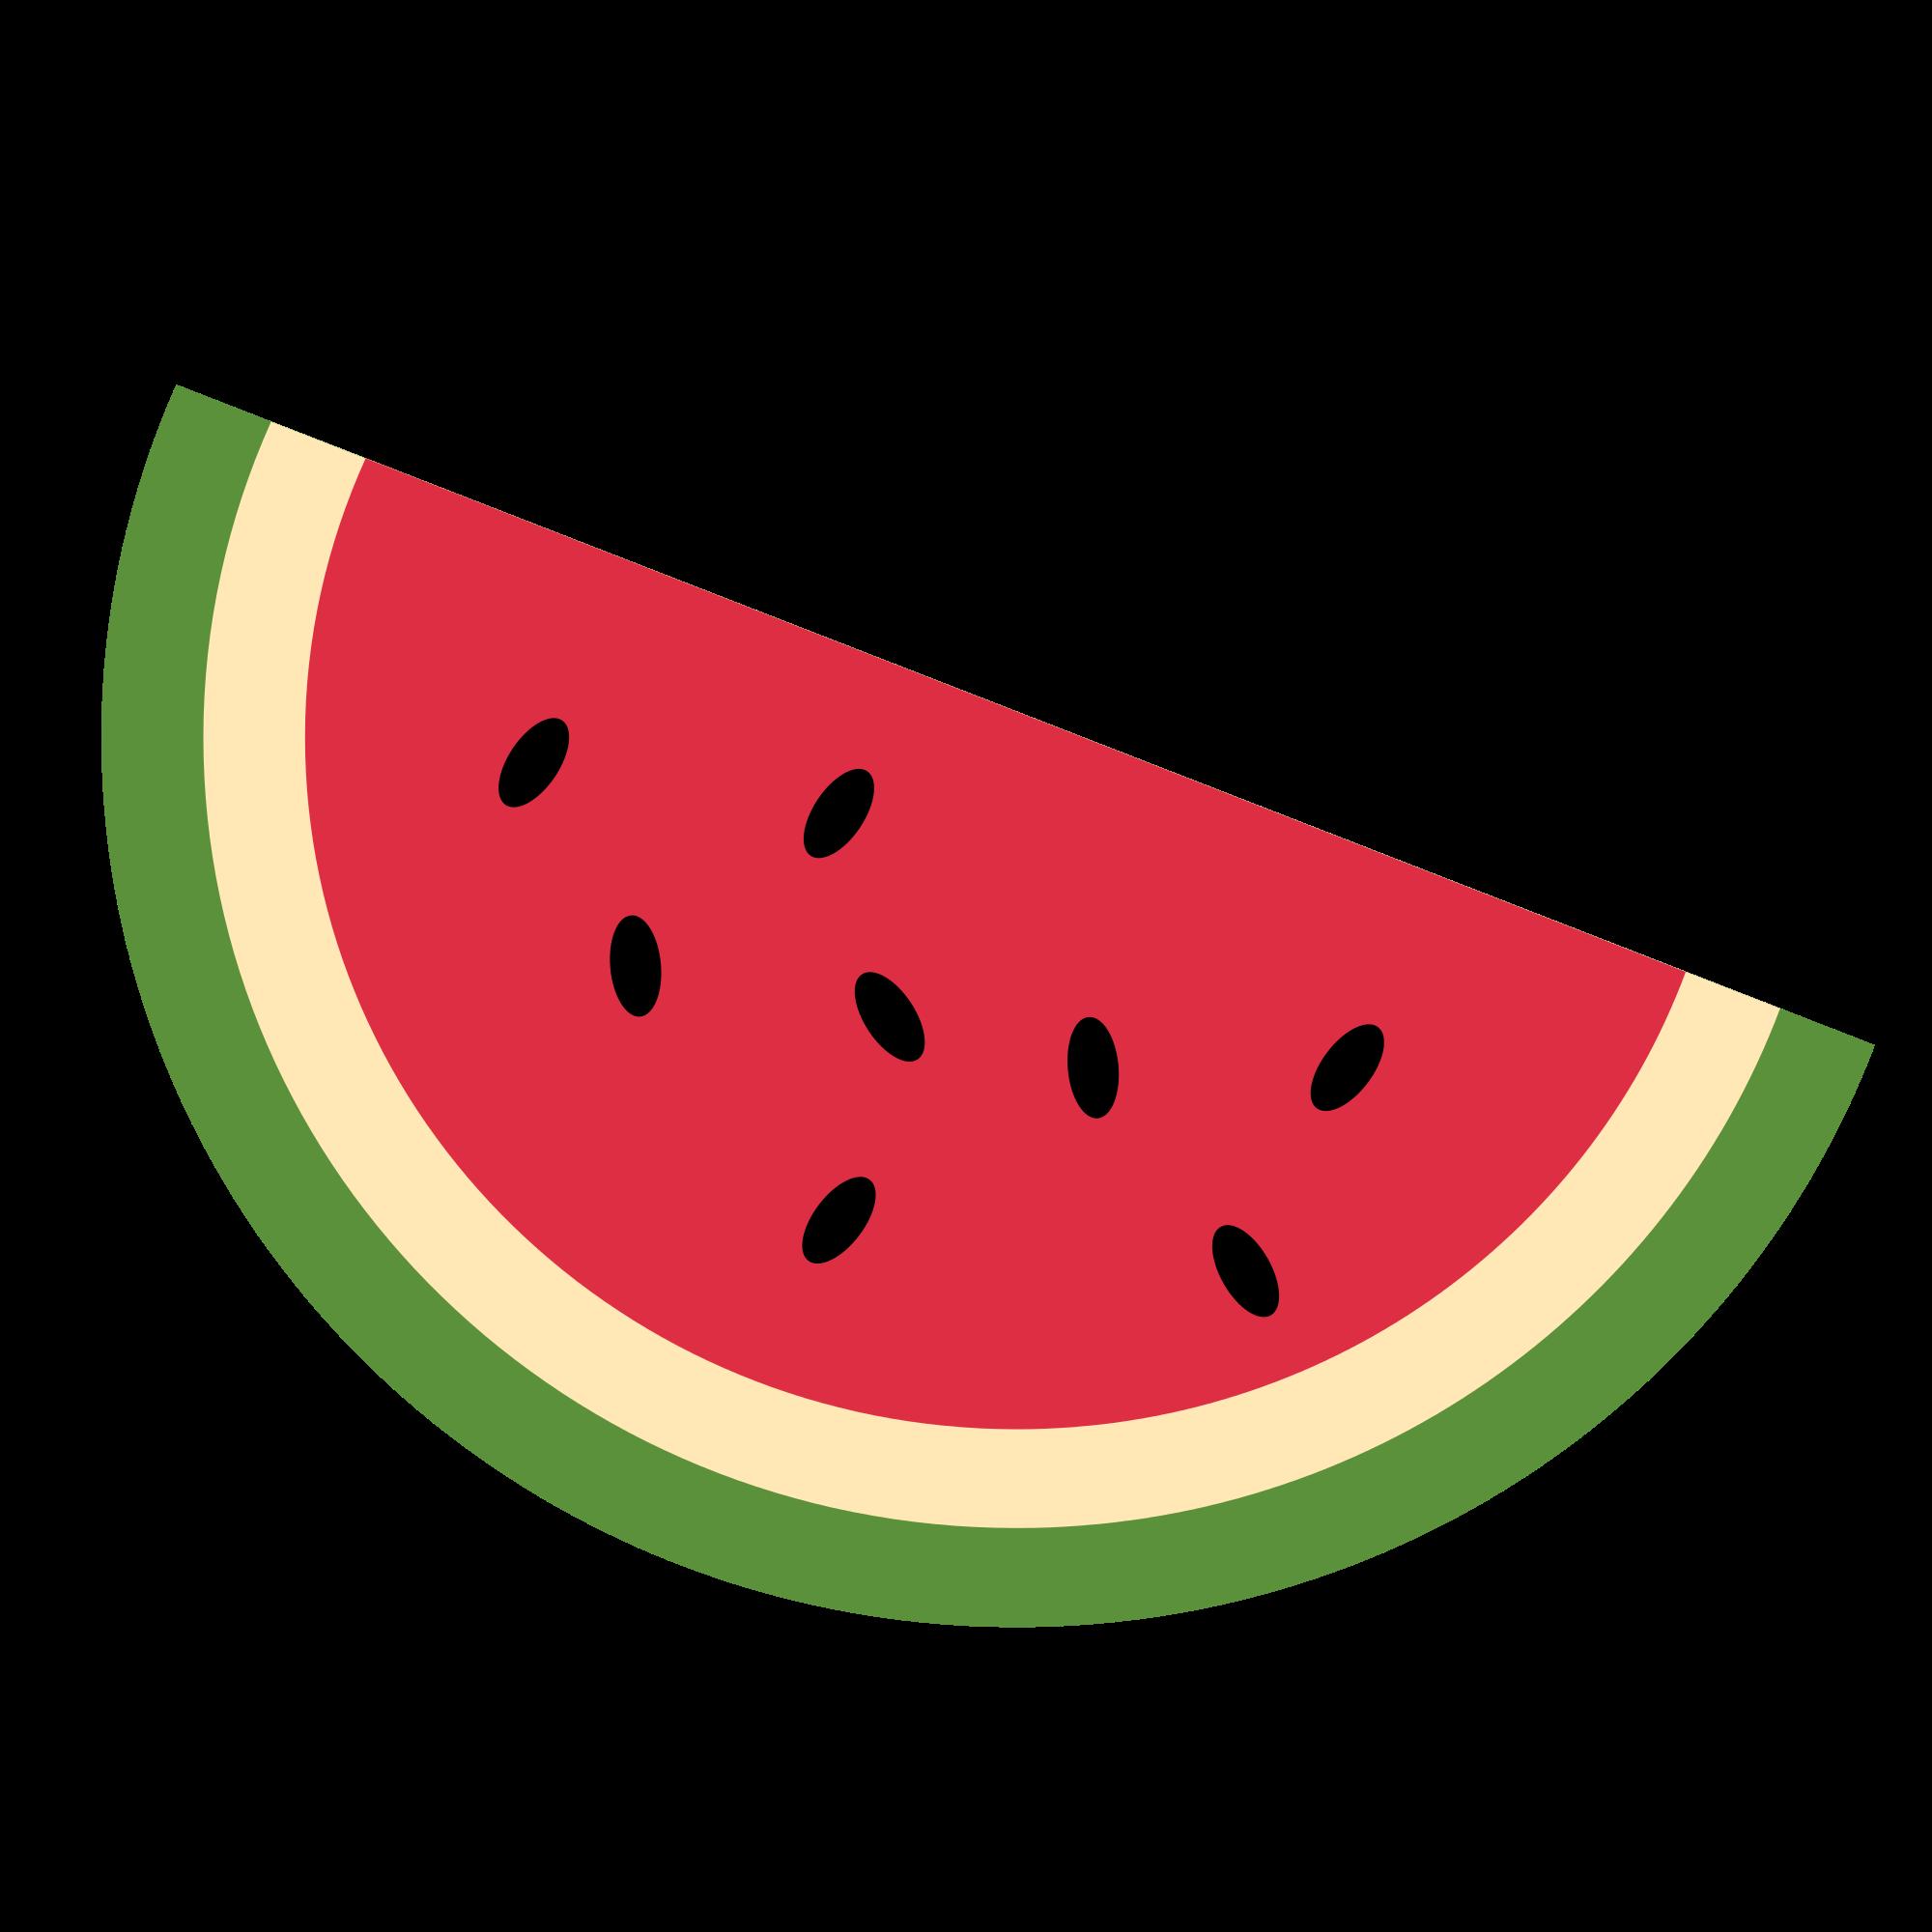 File twemoji f svg. Watermelon clipart emoji